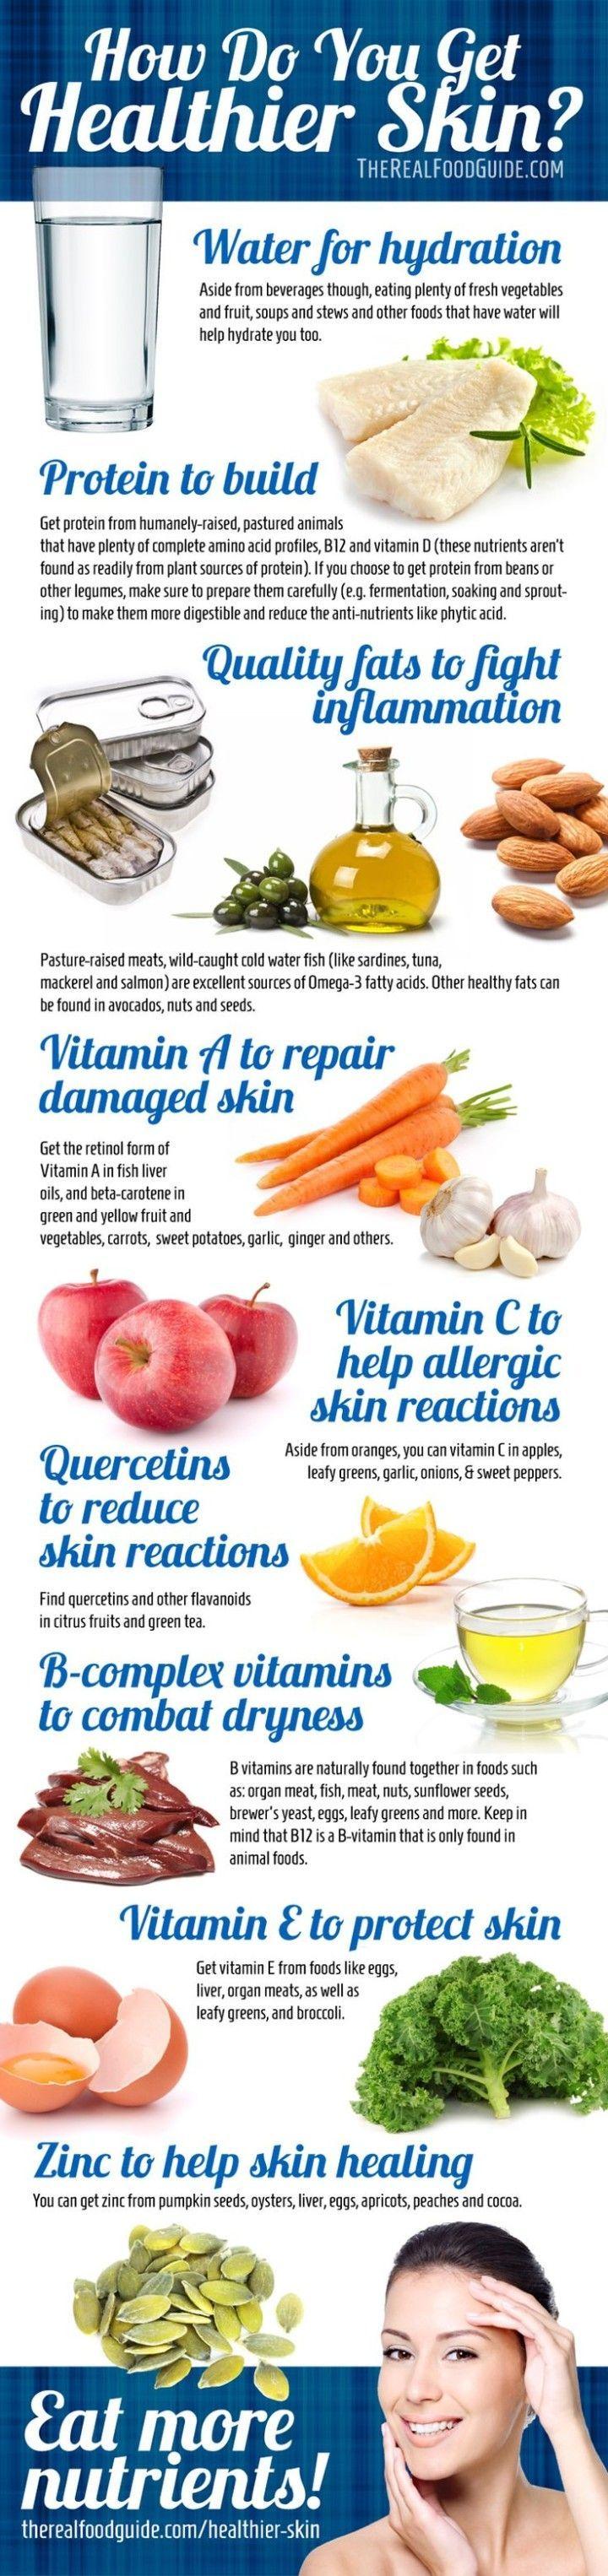 "How Do You Get Healthier Skin?"" via The Real Food Guide"